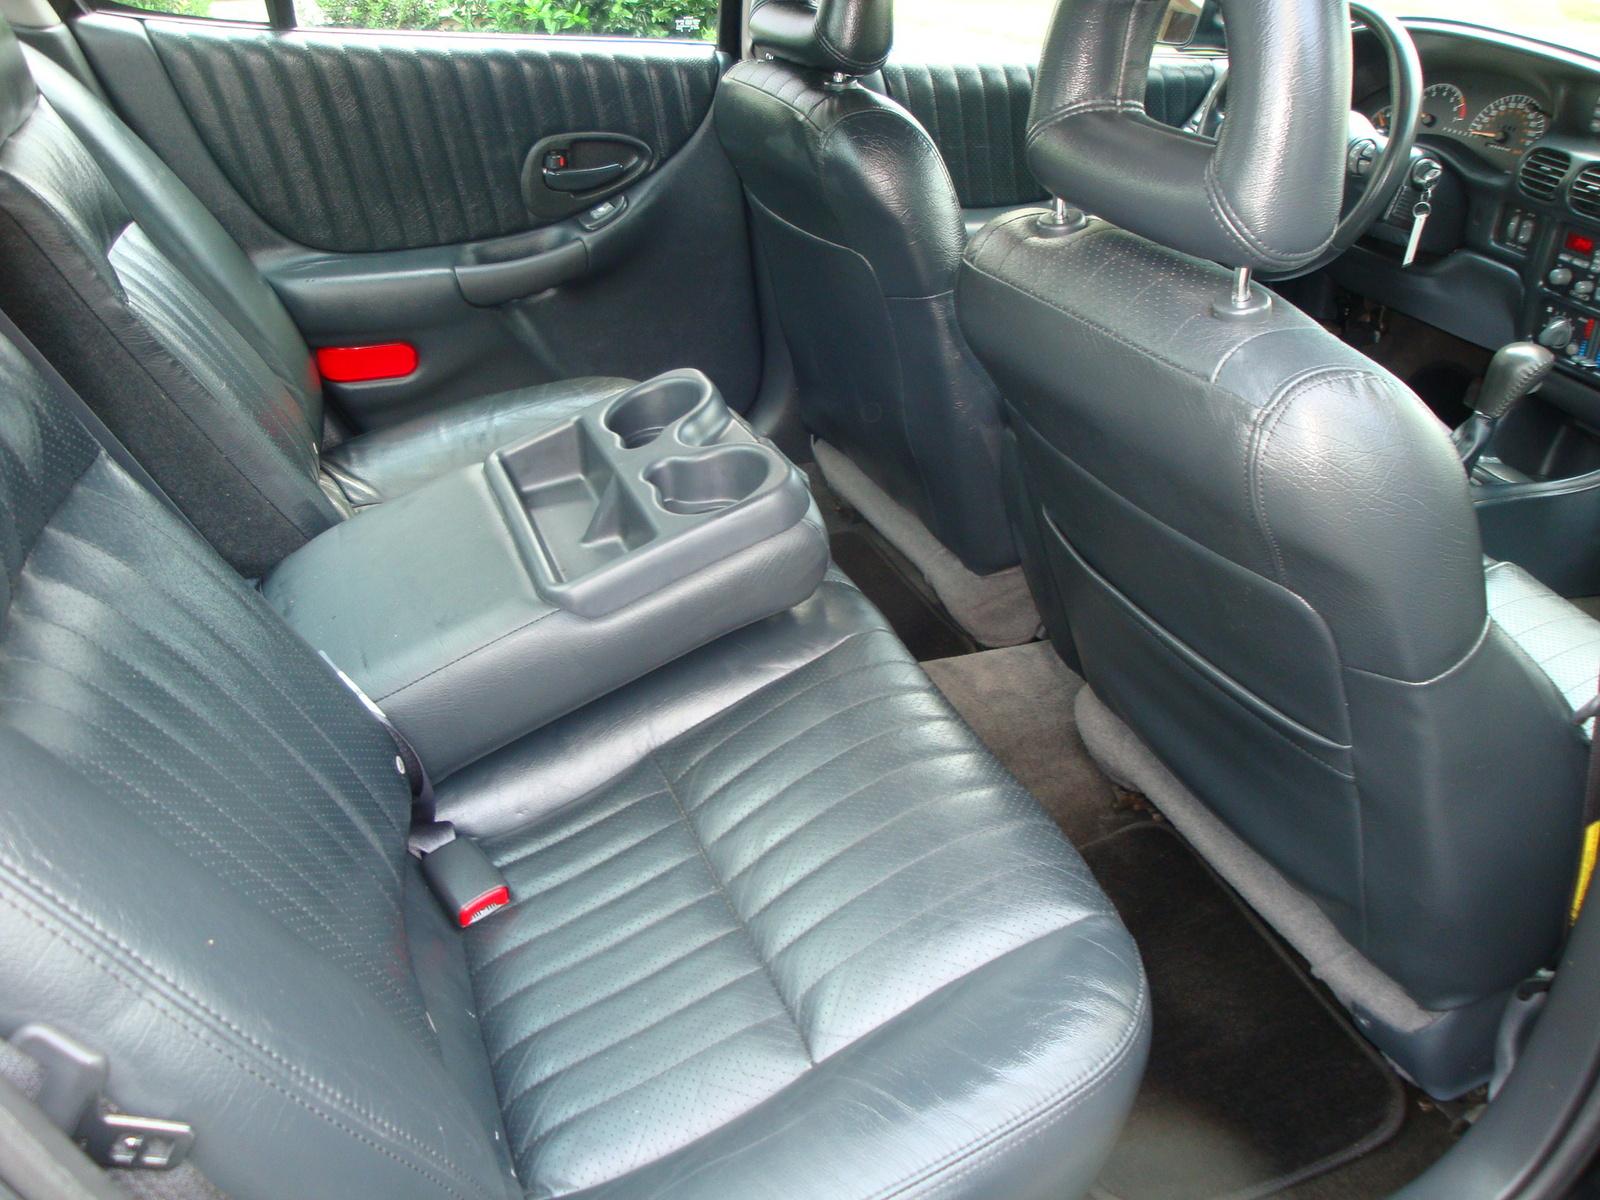 famous 2000 pontiac grand prix gtp coupe picture interior. Black Bedroom Furniture Sets. Home Design Ideas